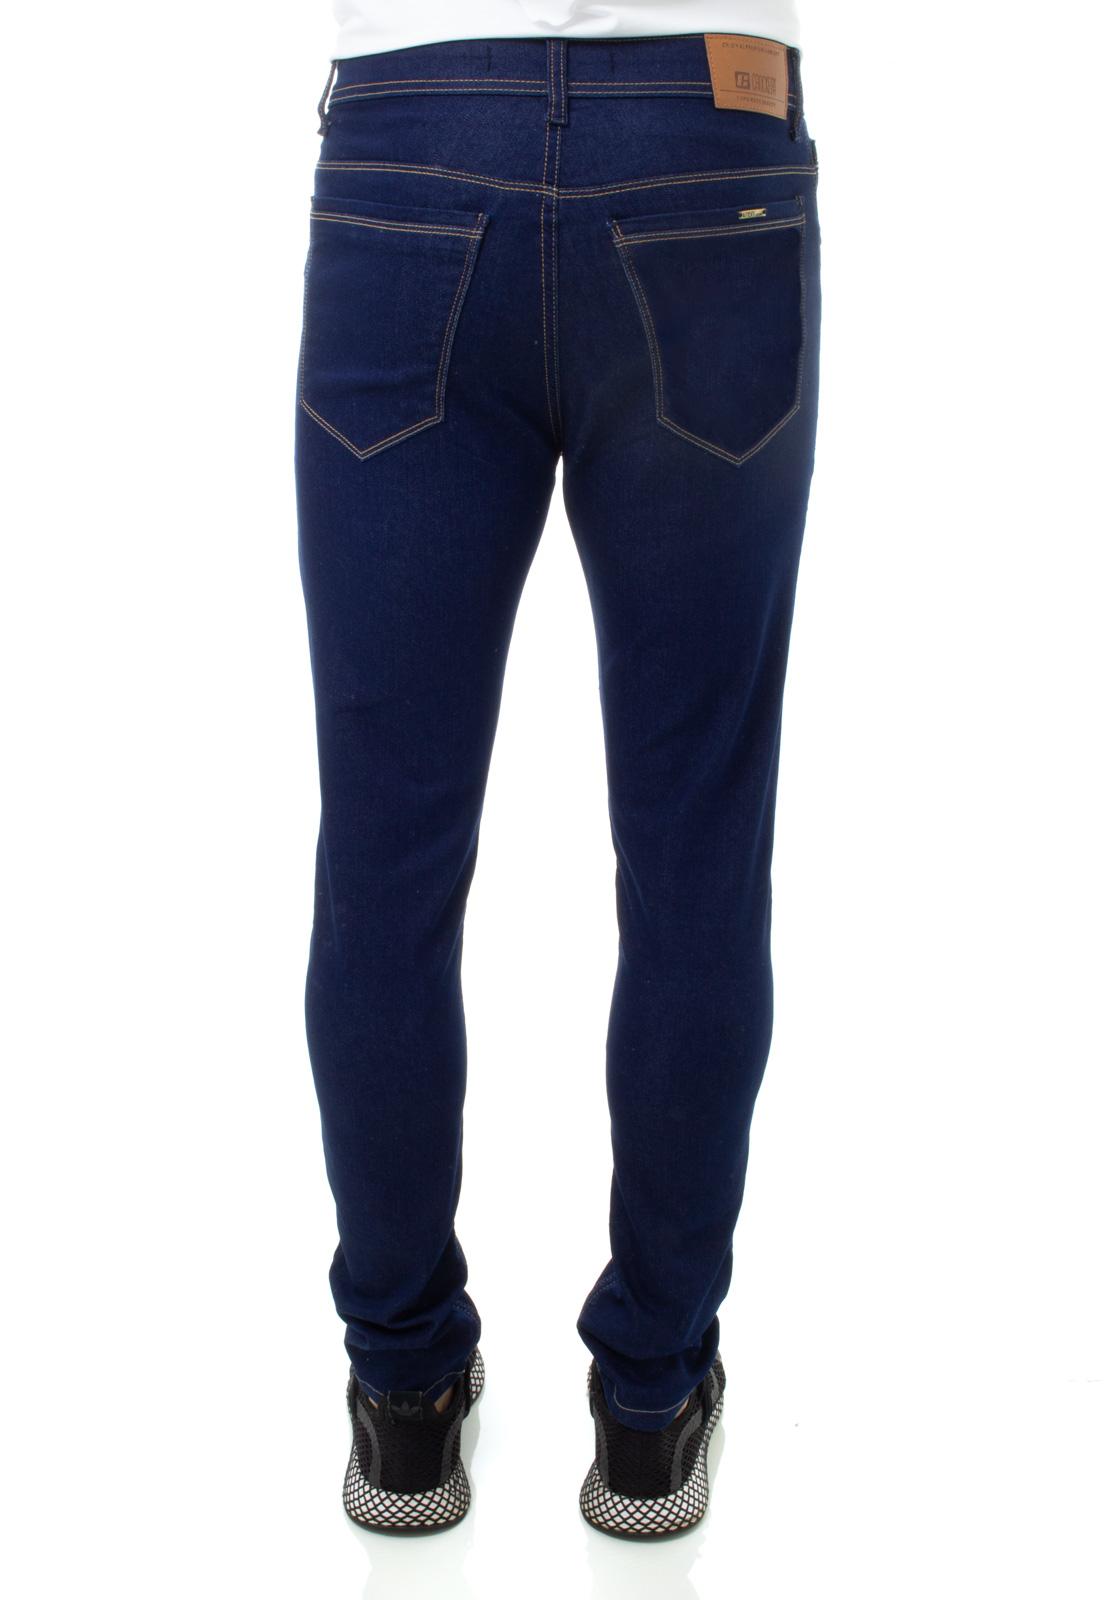 Calça Confort Jeans Masculina Crocker - 48230  - CROCKER JEANS